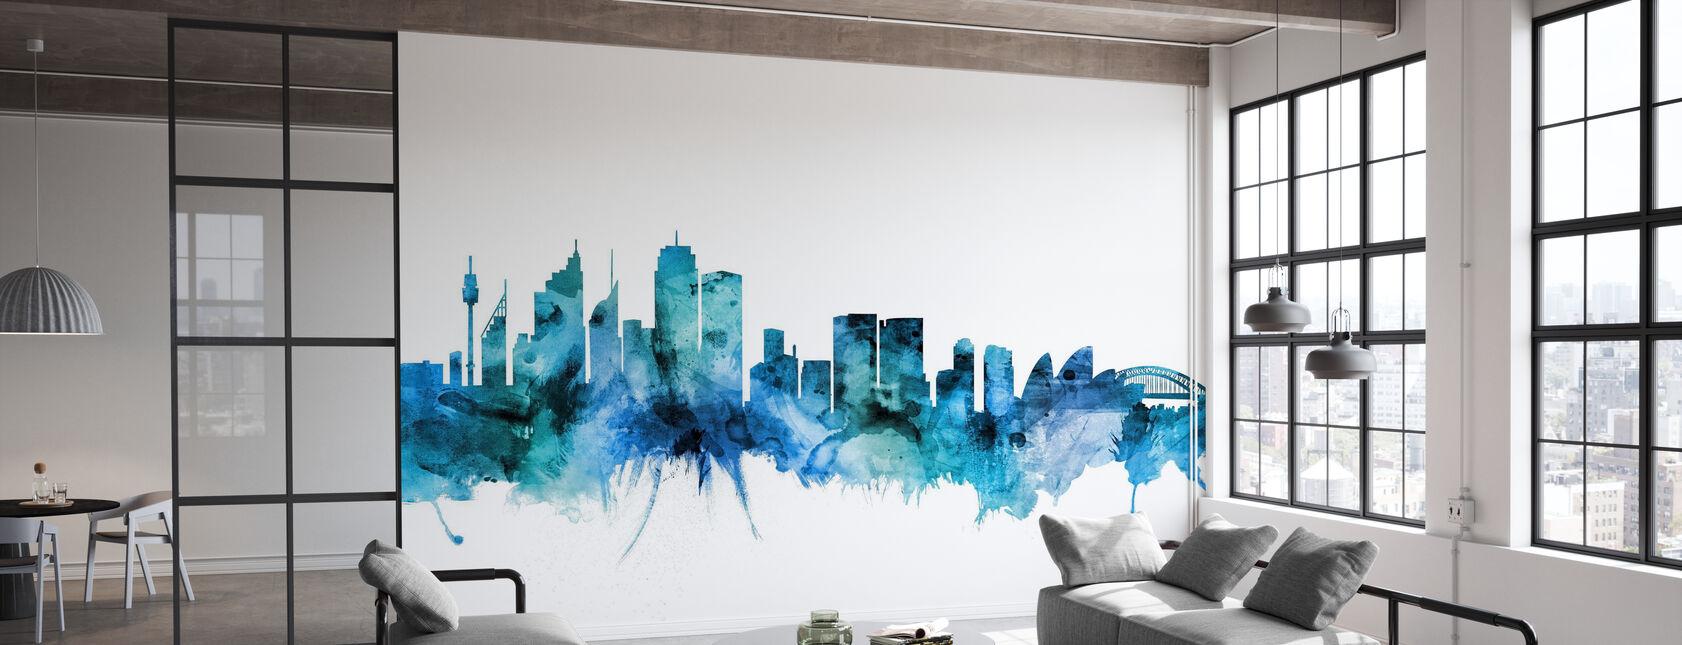 Sydney Australia Skyline - Wallpaper - Office